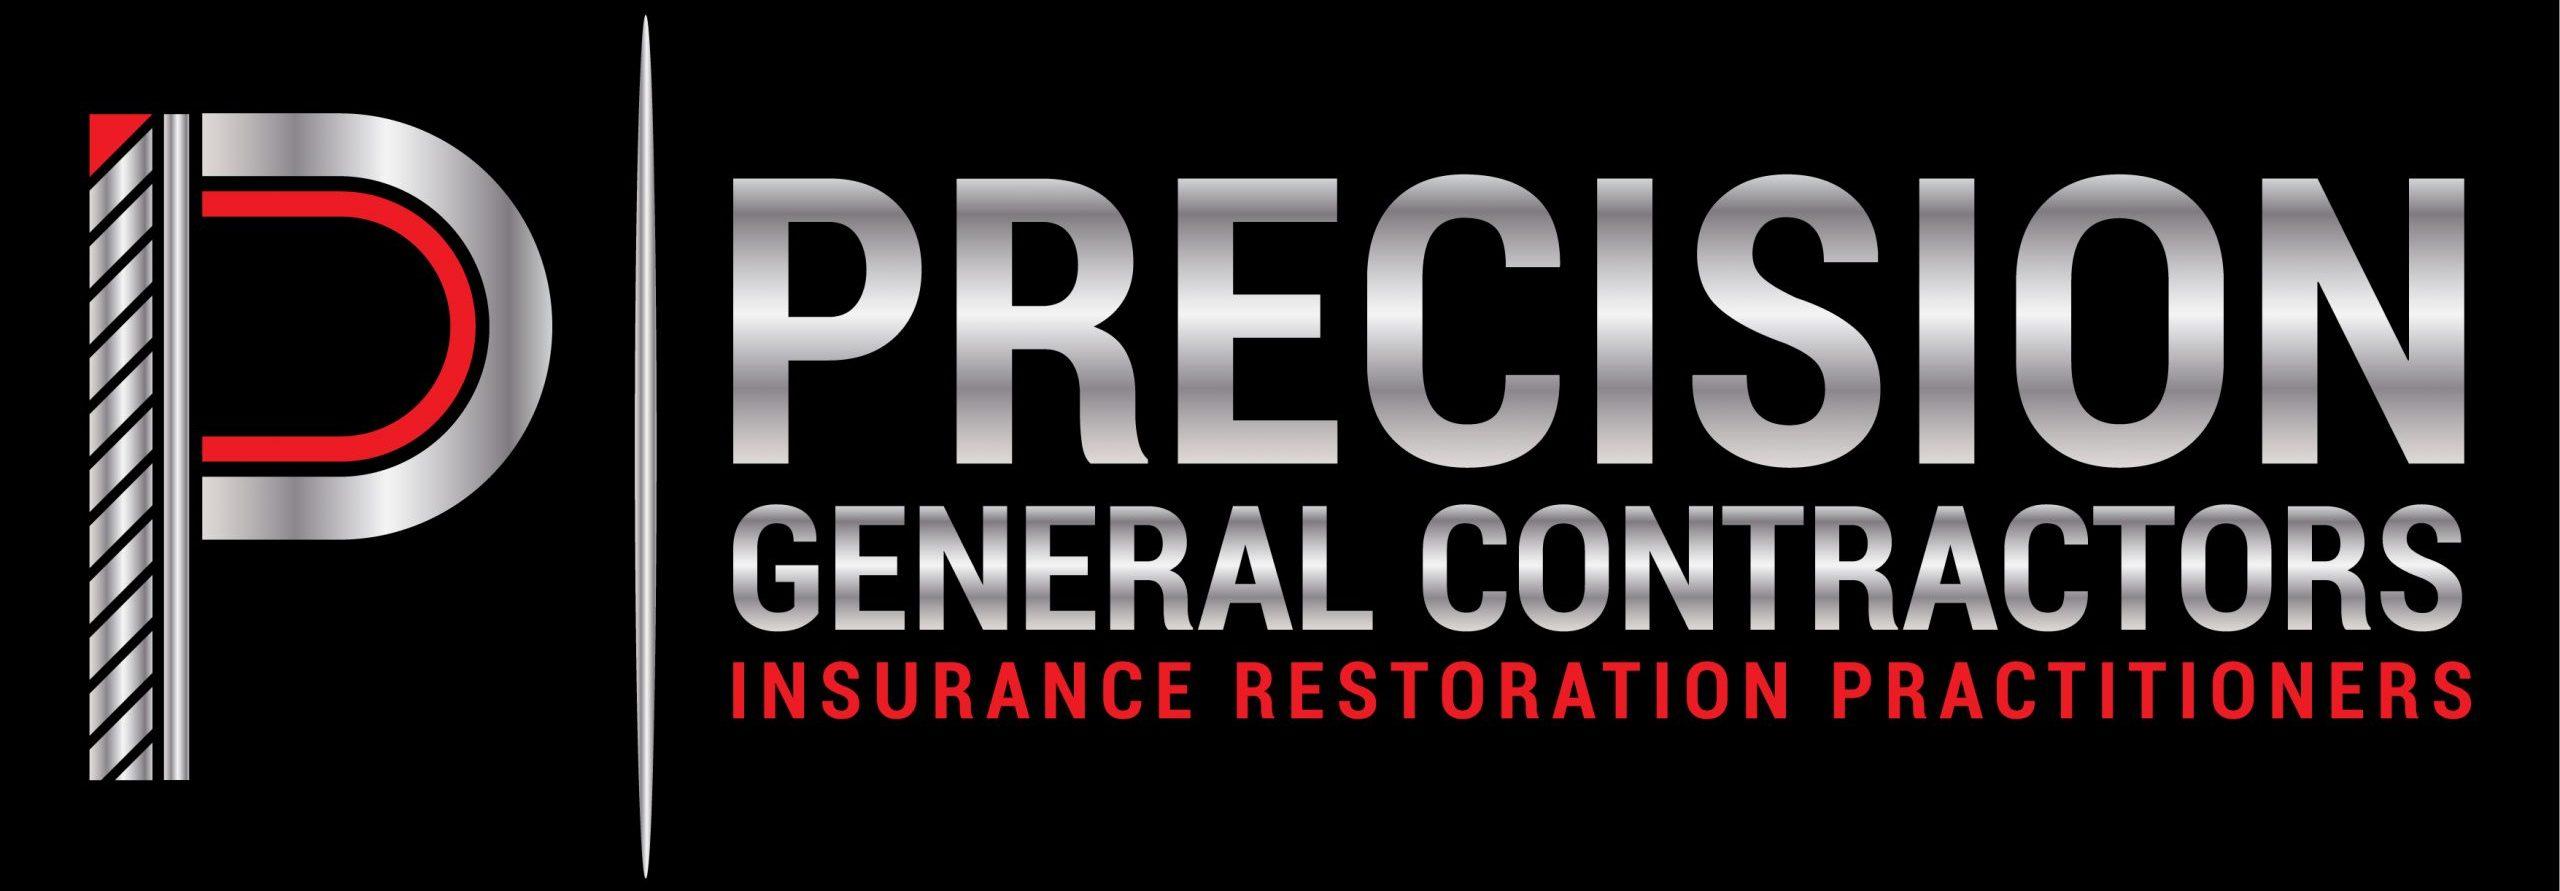 Precision General Contractors